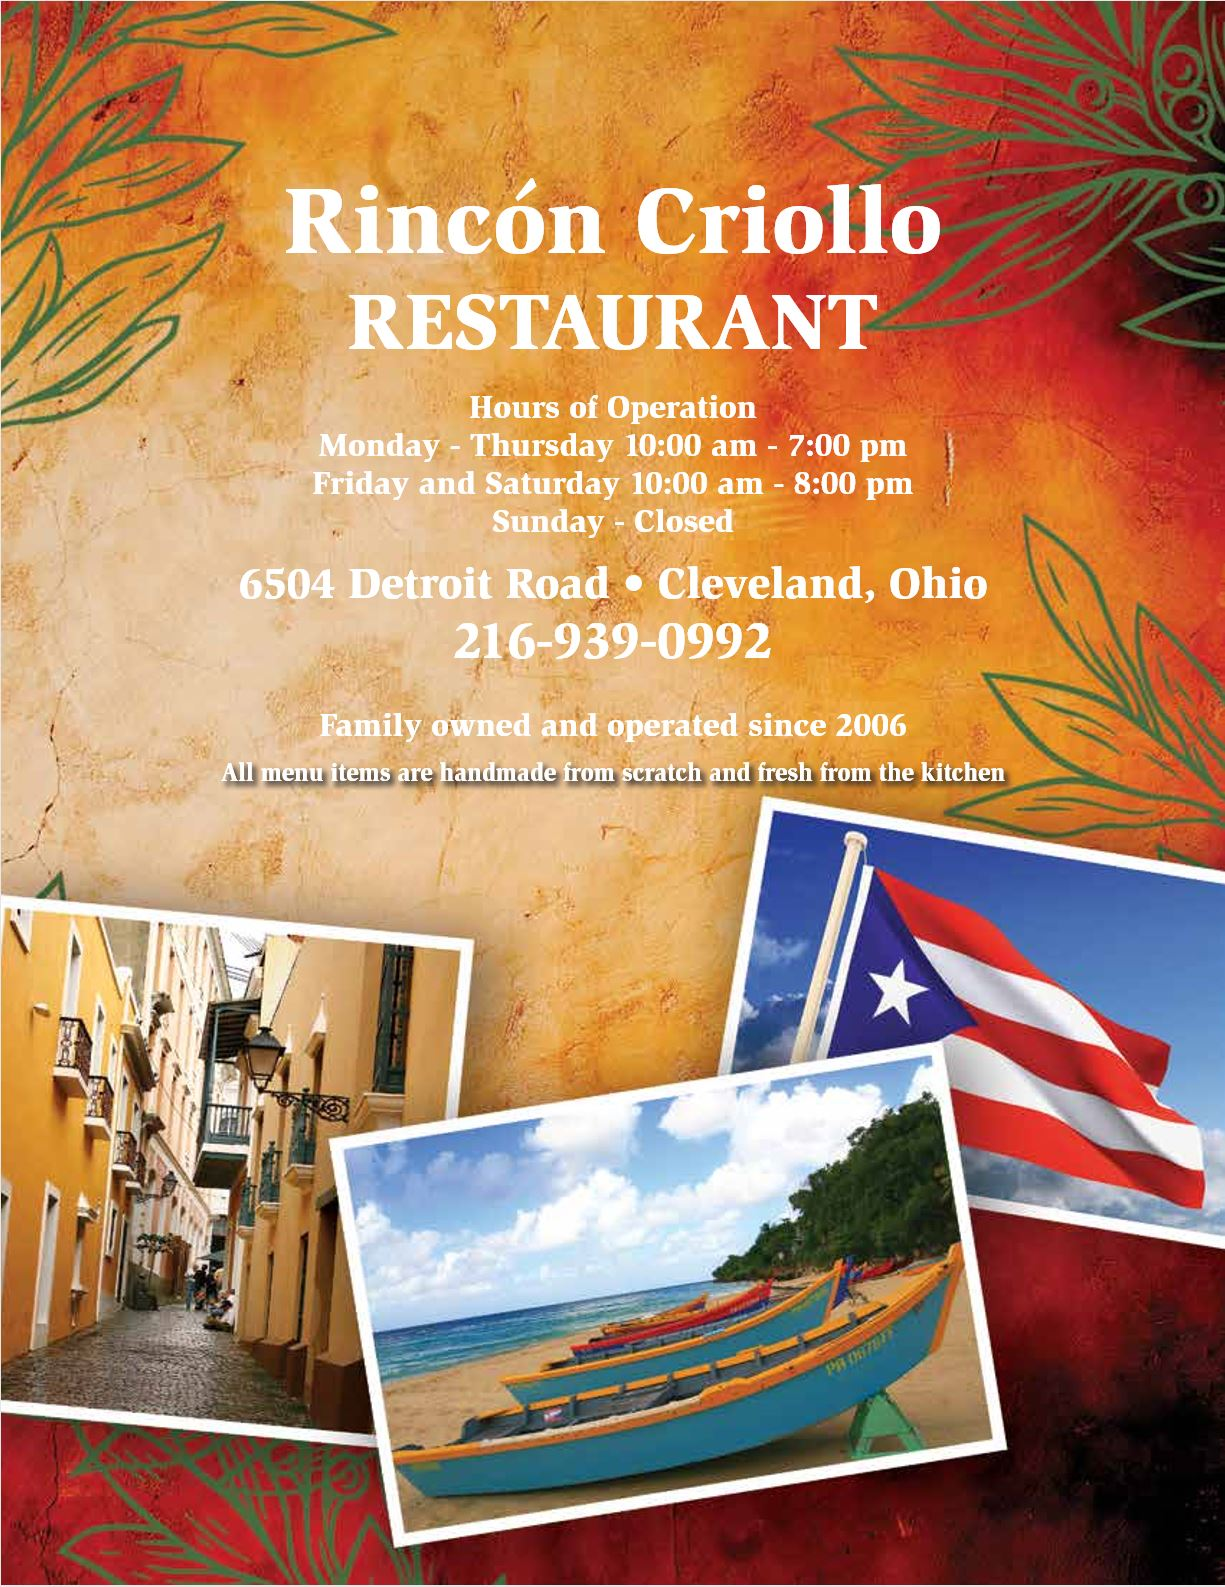 Rincon_Criollo_Menu_Page_1.JPG